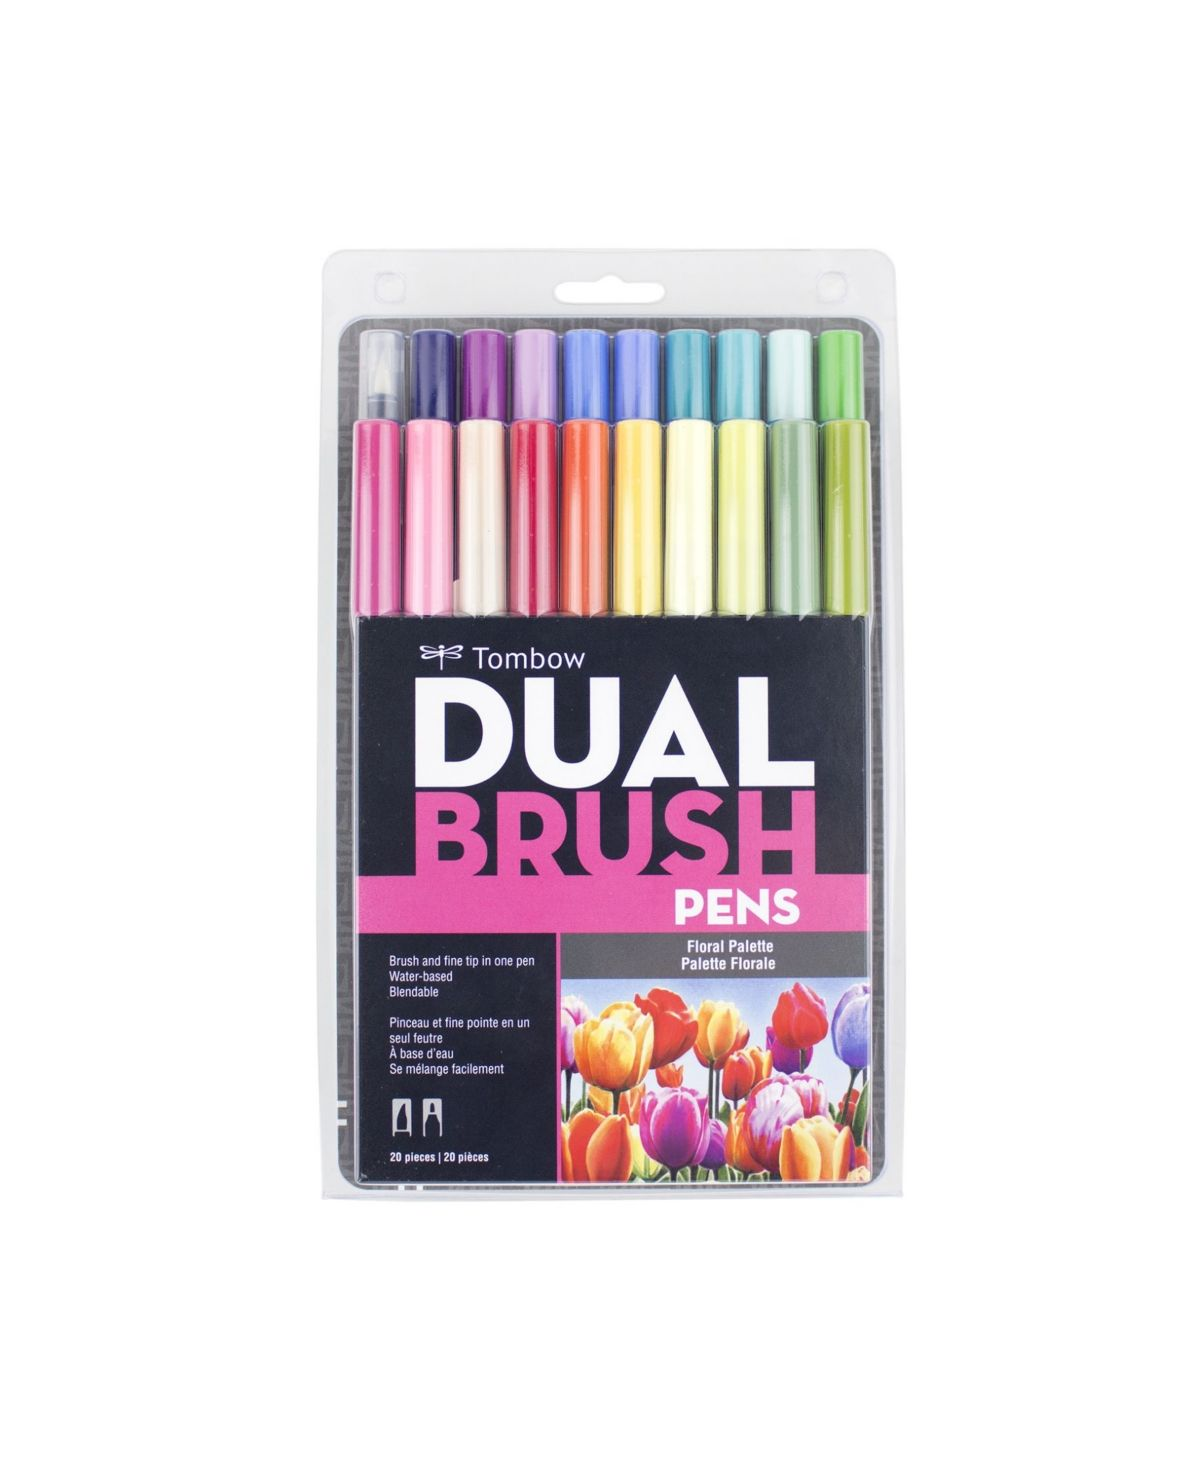 20-Pack Assorted Colors Metallic Art Pen Permanent Markers Fine Tip//Flexible Tip